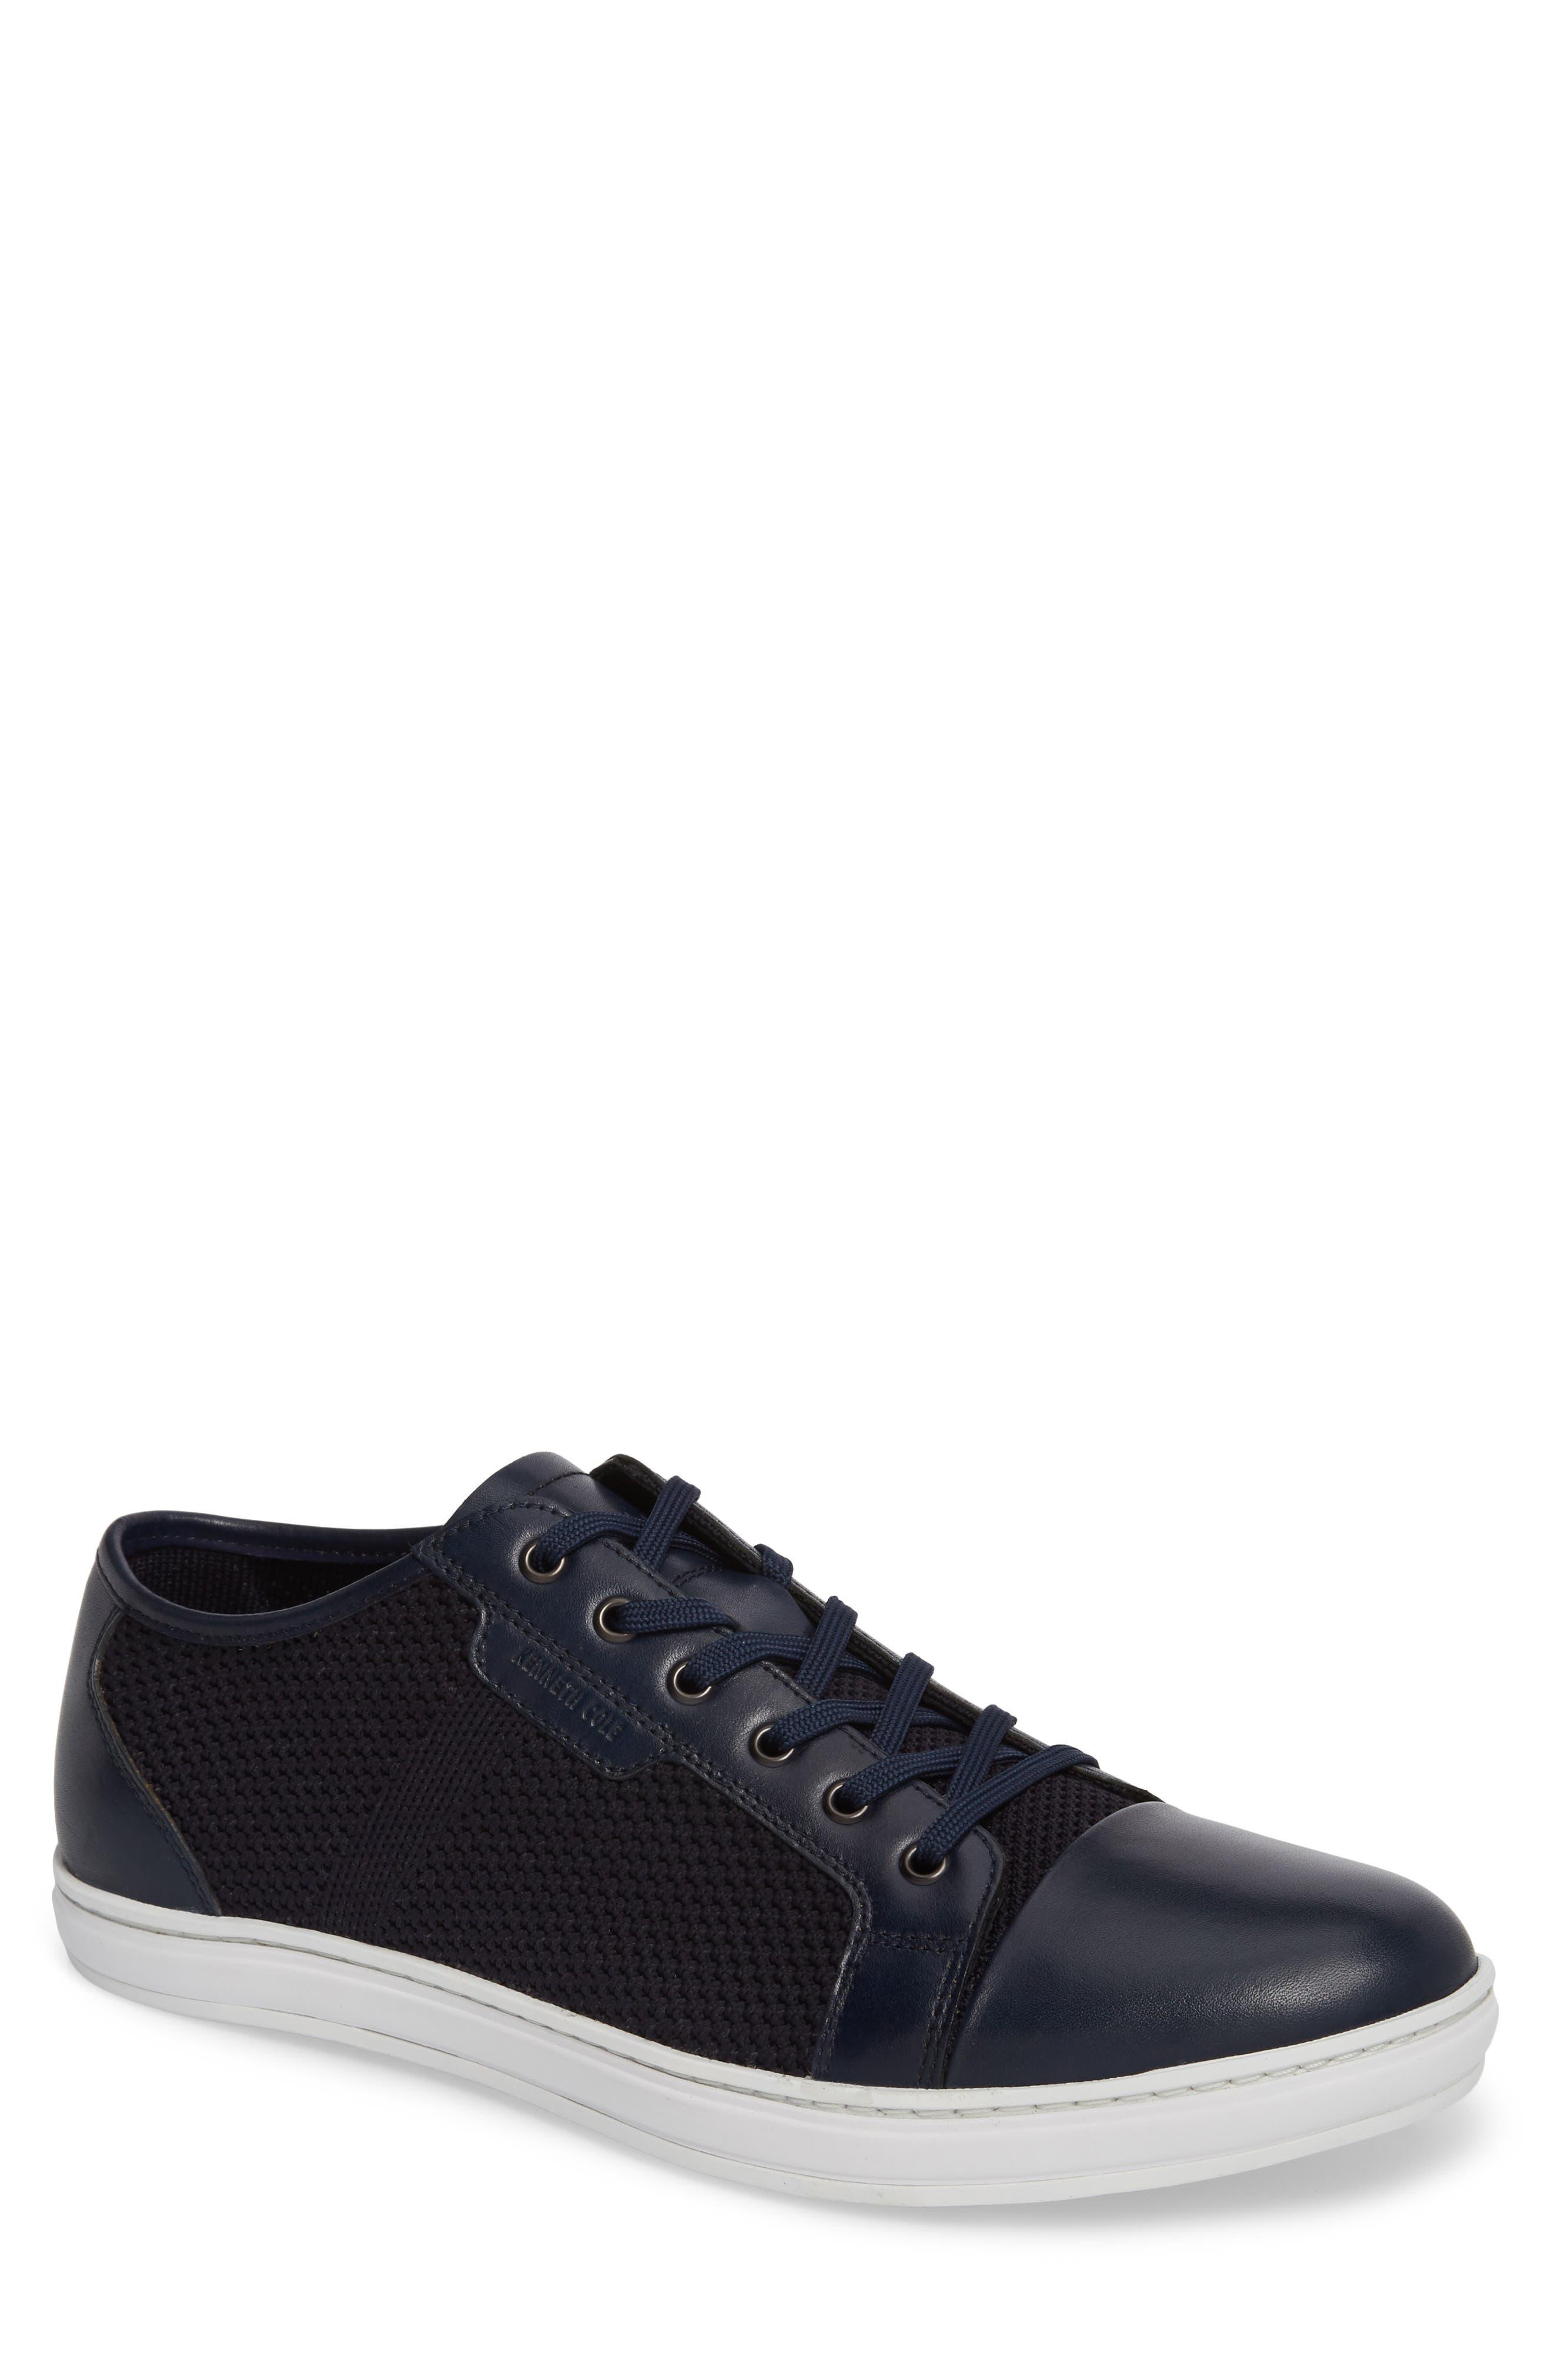 Kenneth Cole New York Knit Low Top Sneaker (Men)